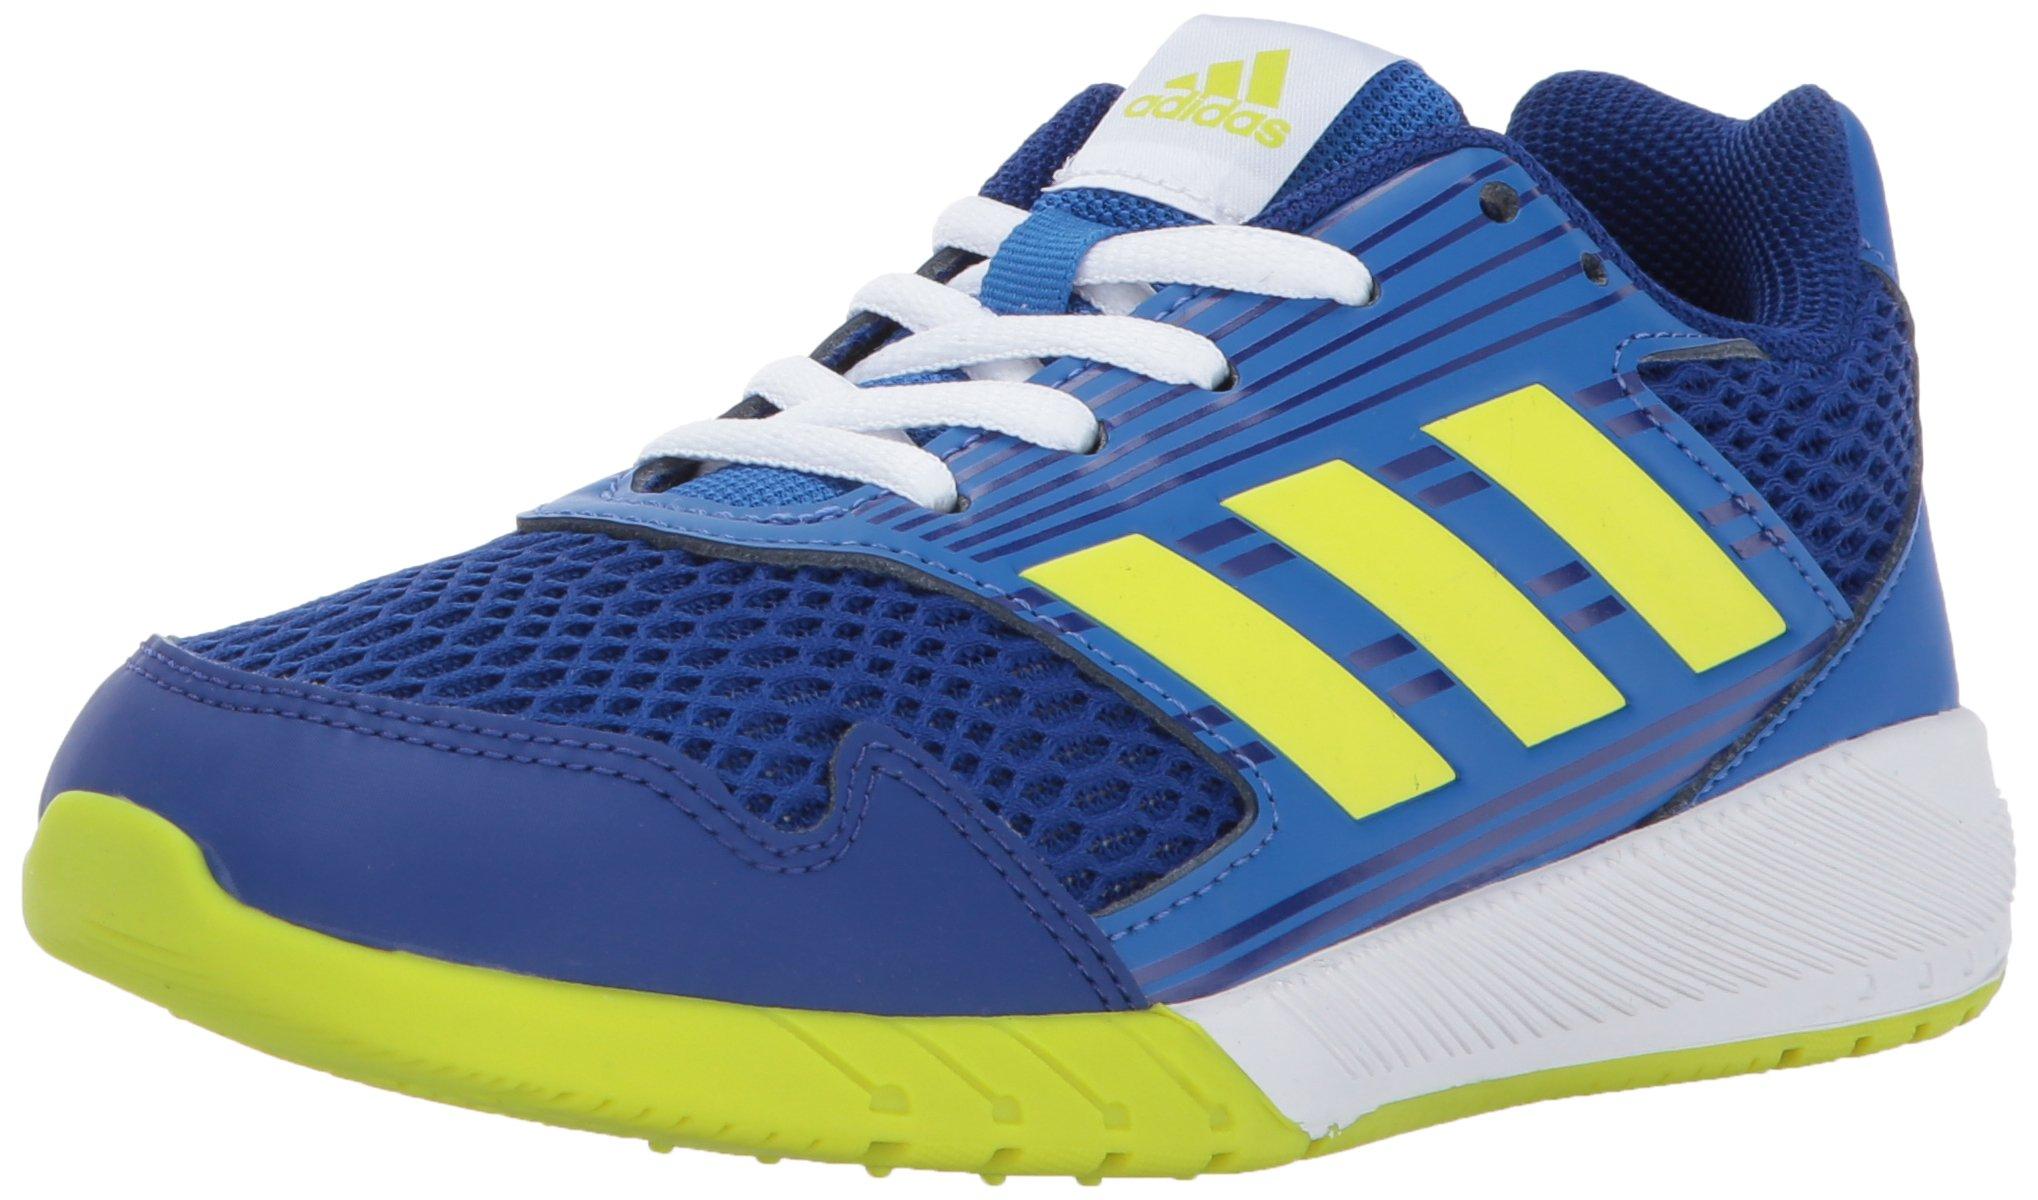 adidas Performance Boys' Altarun K Running-Shoes, Mystery Ink/Semi Solar Yellow/Blue, 4.5 Medium US Little Kid